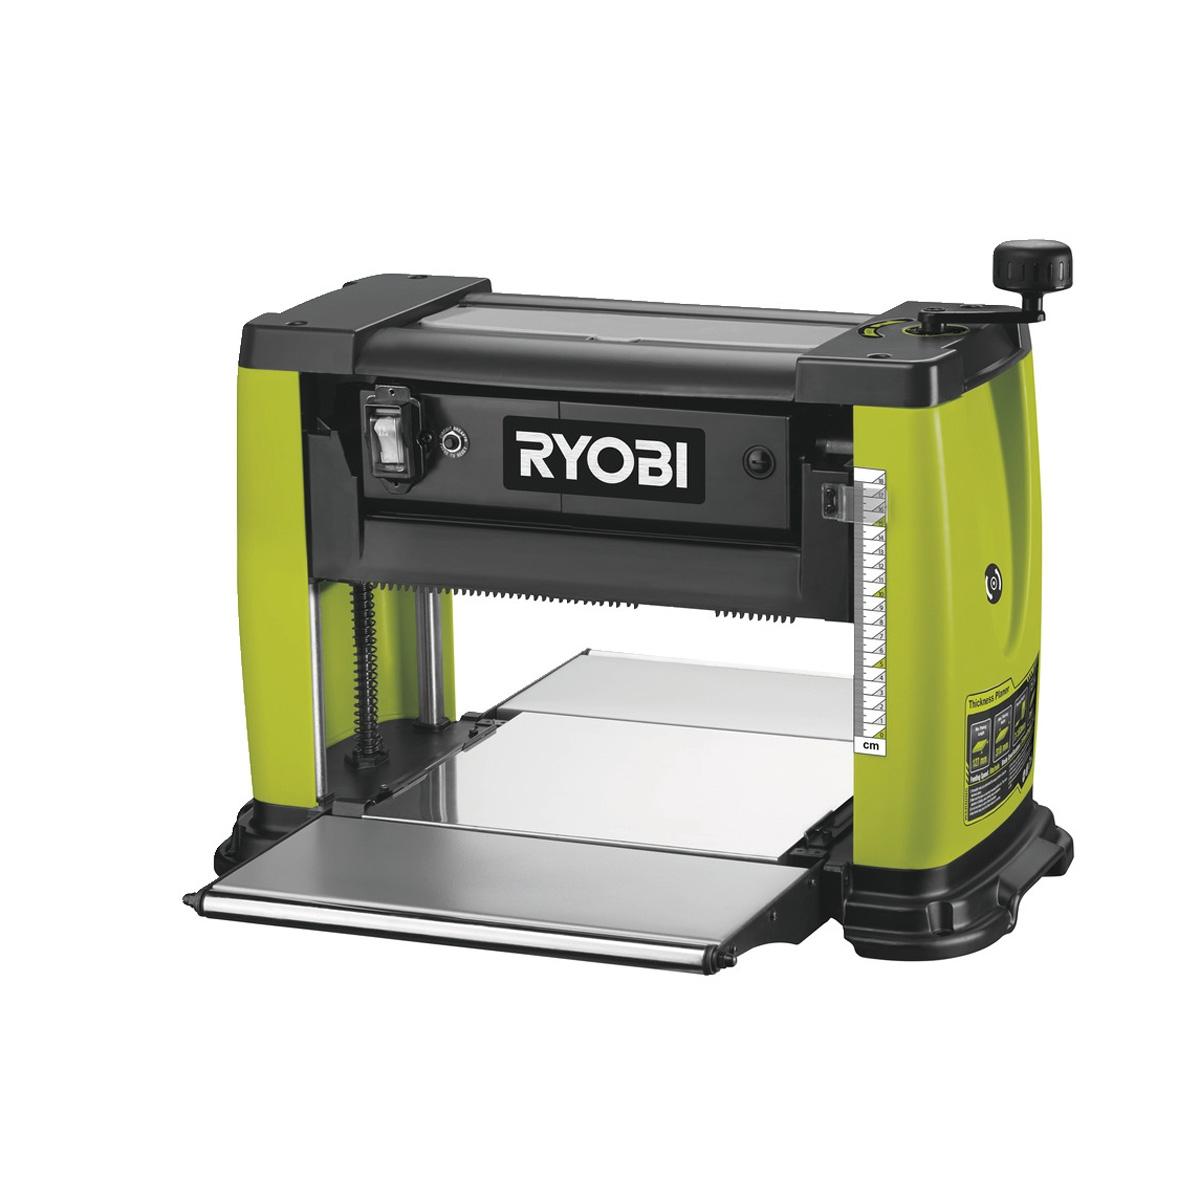 RYOBI RAP1500G Fixed planer